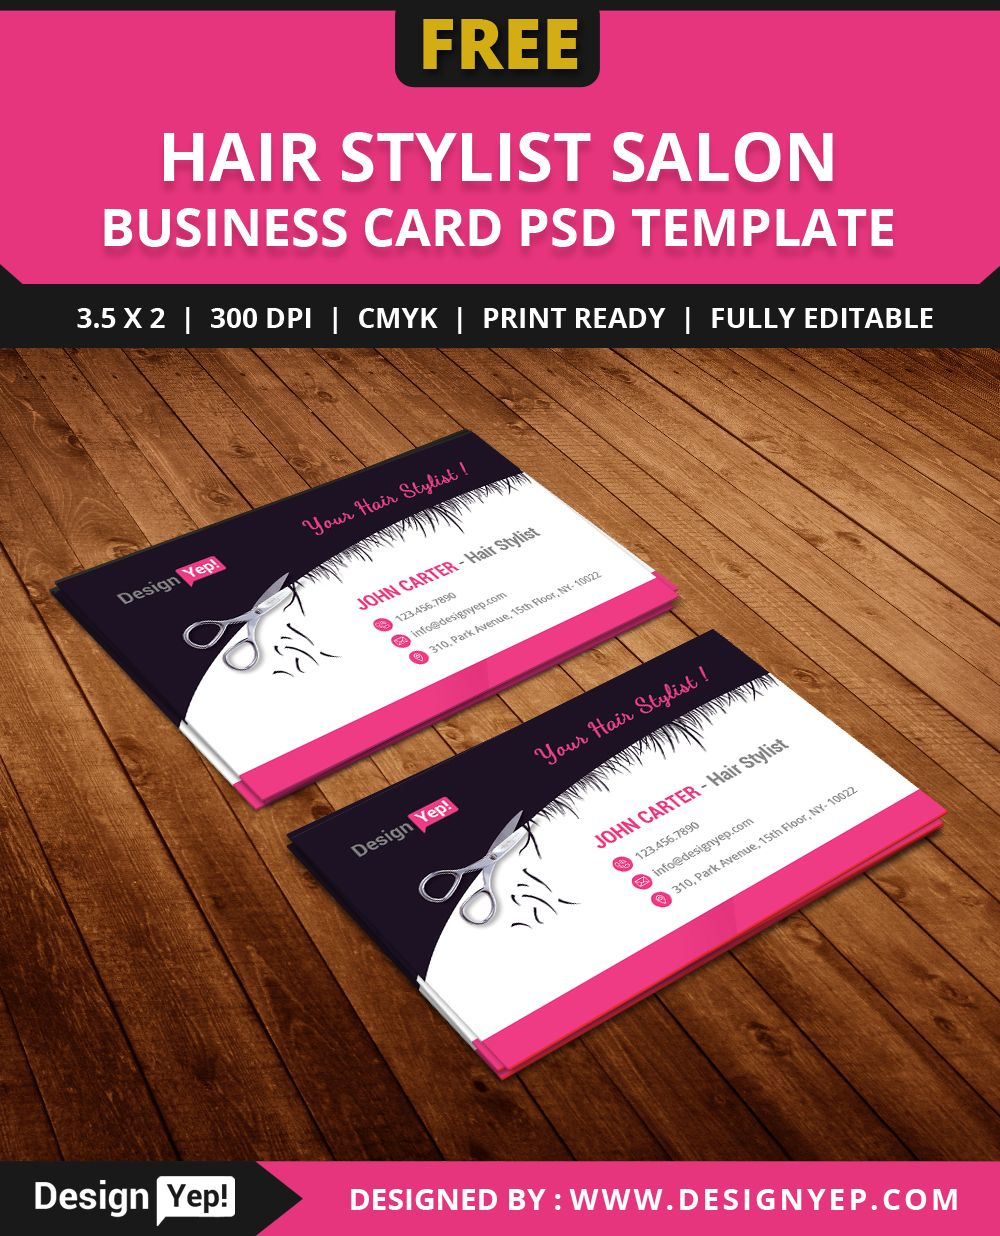 Free Hair Stylist Salon Business Card Template Psd   Free Regarding Hairdresser Business Card Templates Free